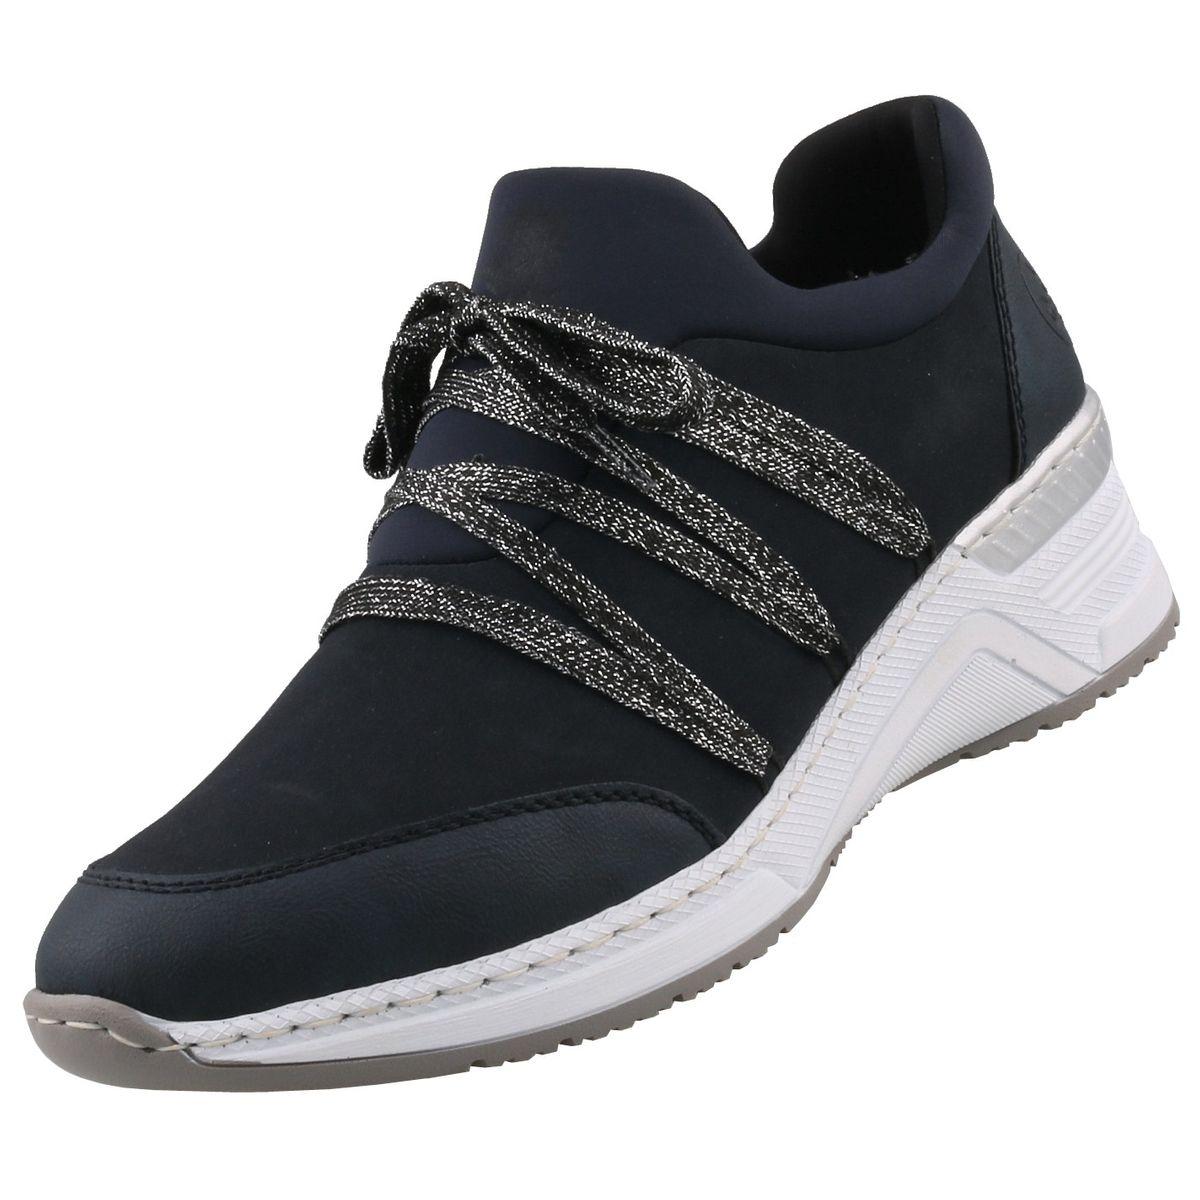 Rieker Damen Sneaker Blau | Trendbereich